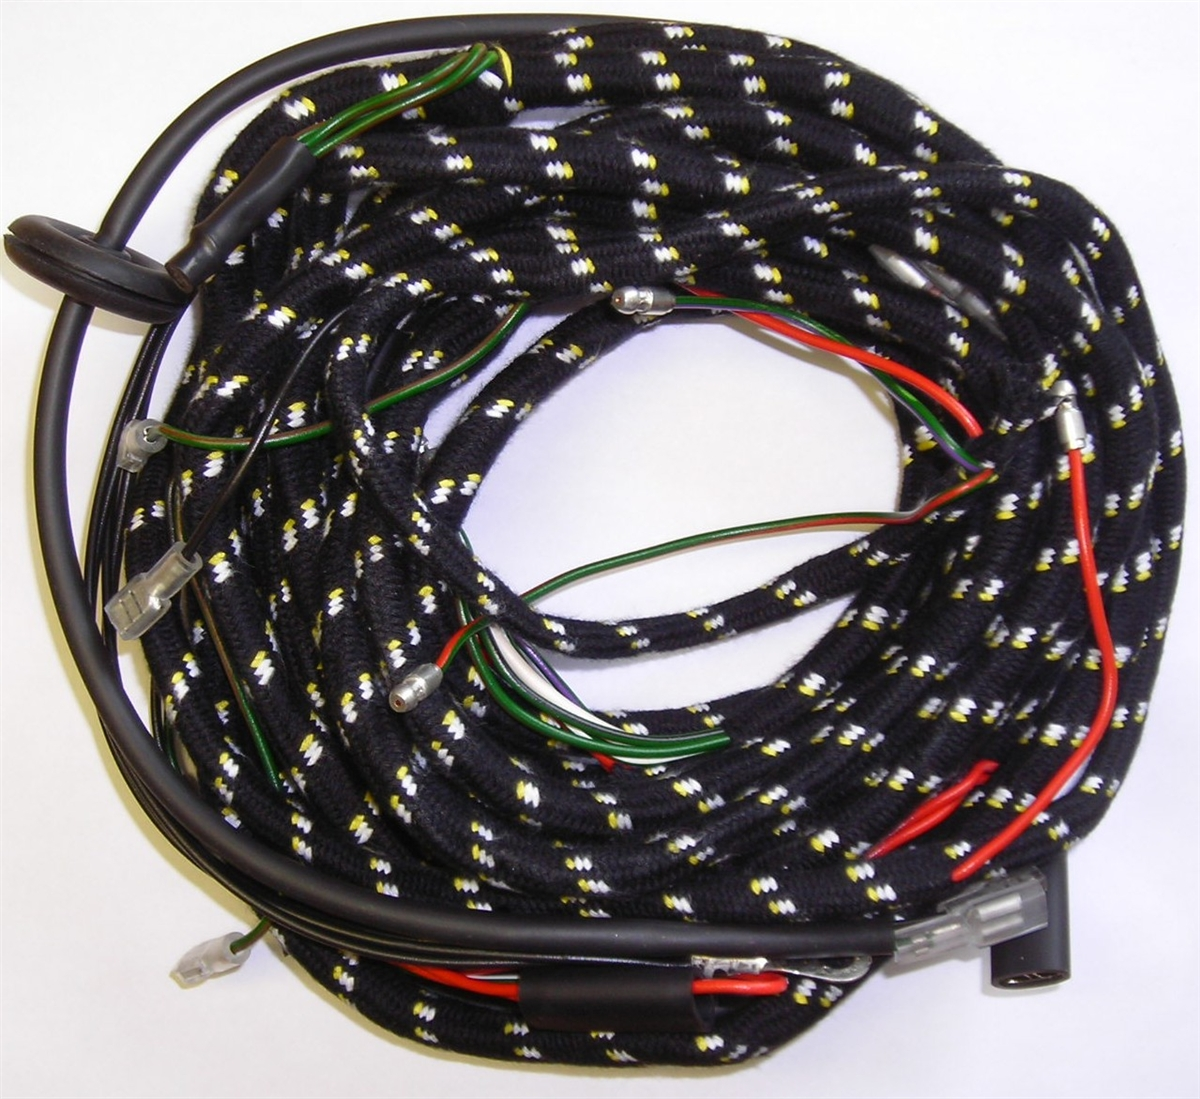 MGC Roadster Wiring Harness (655) on